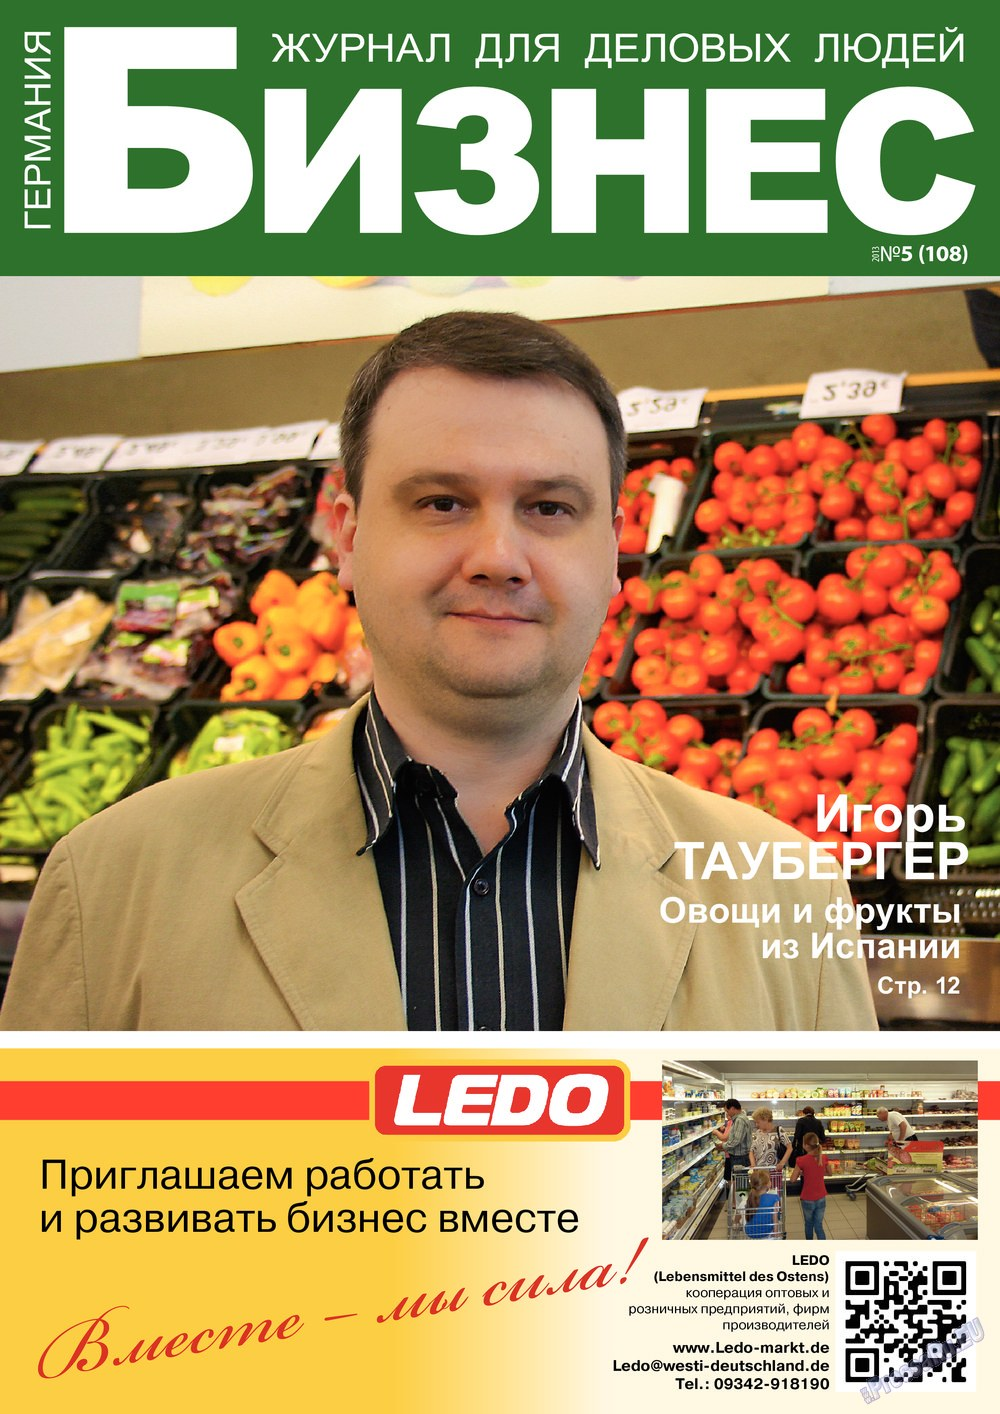 Бизнес (журнал). 2013 год, номер 5, стр. 1